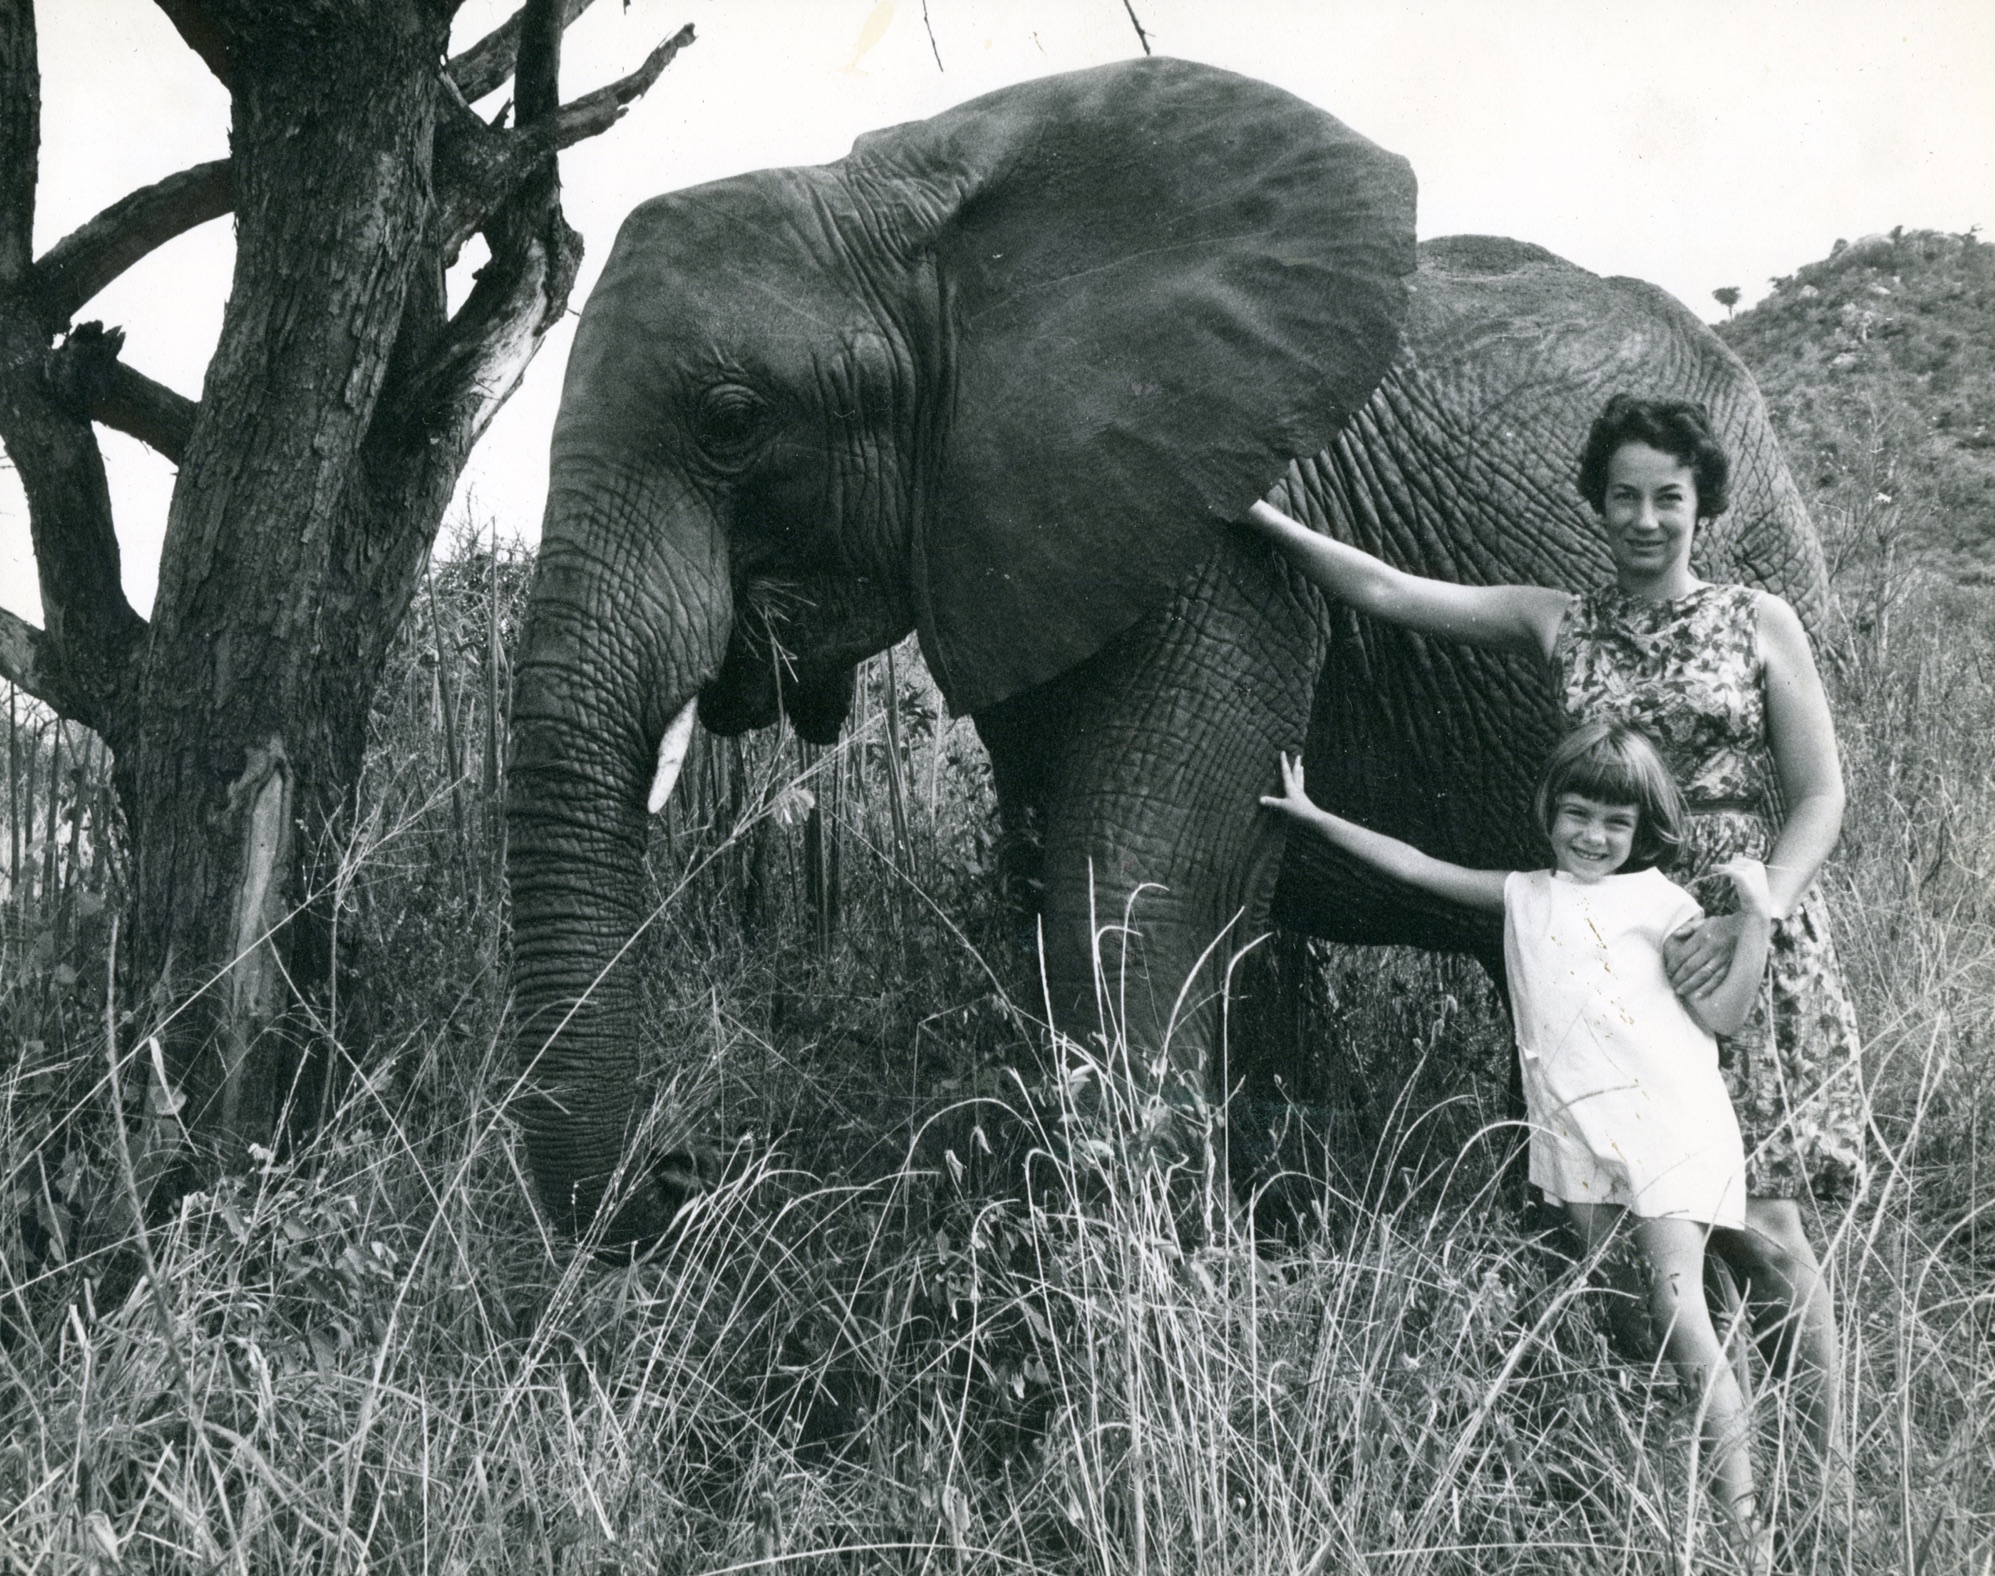 Rhino female dispersed herd of elephants